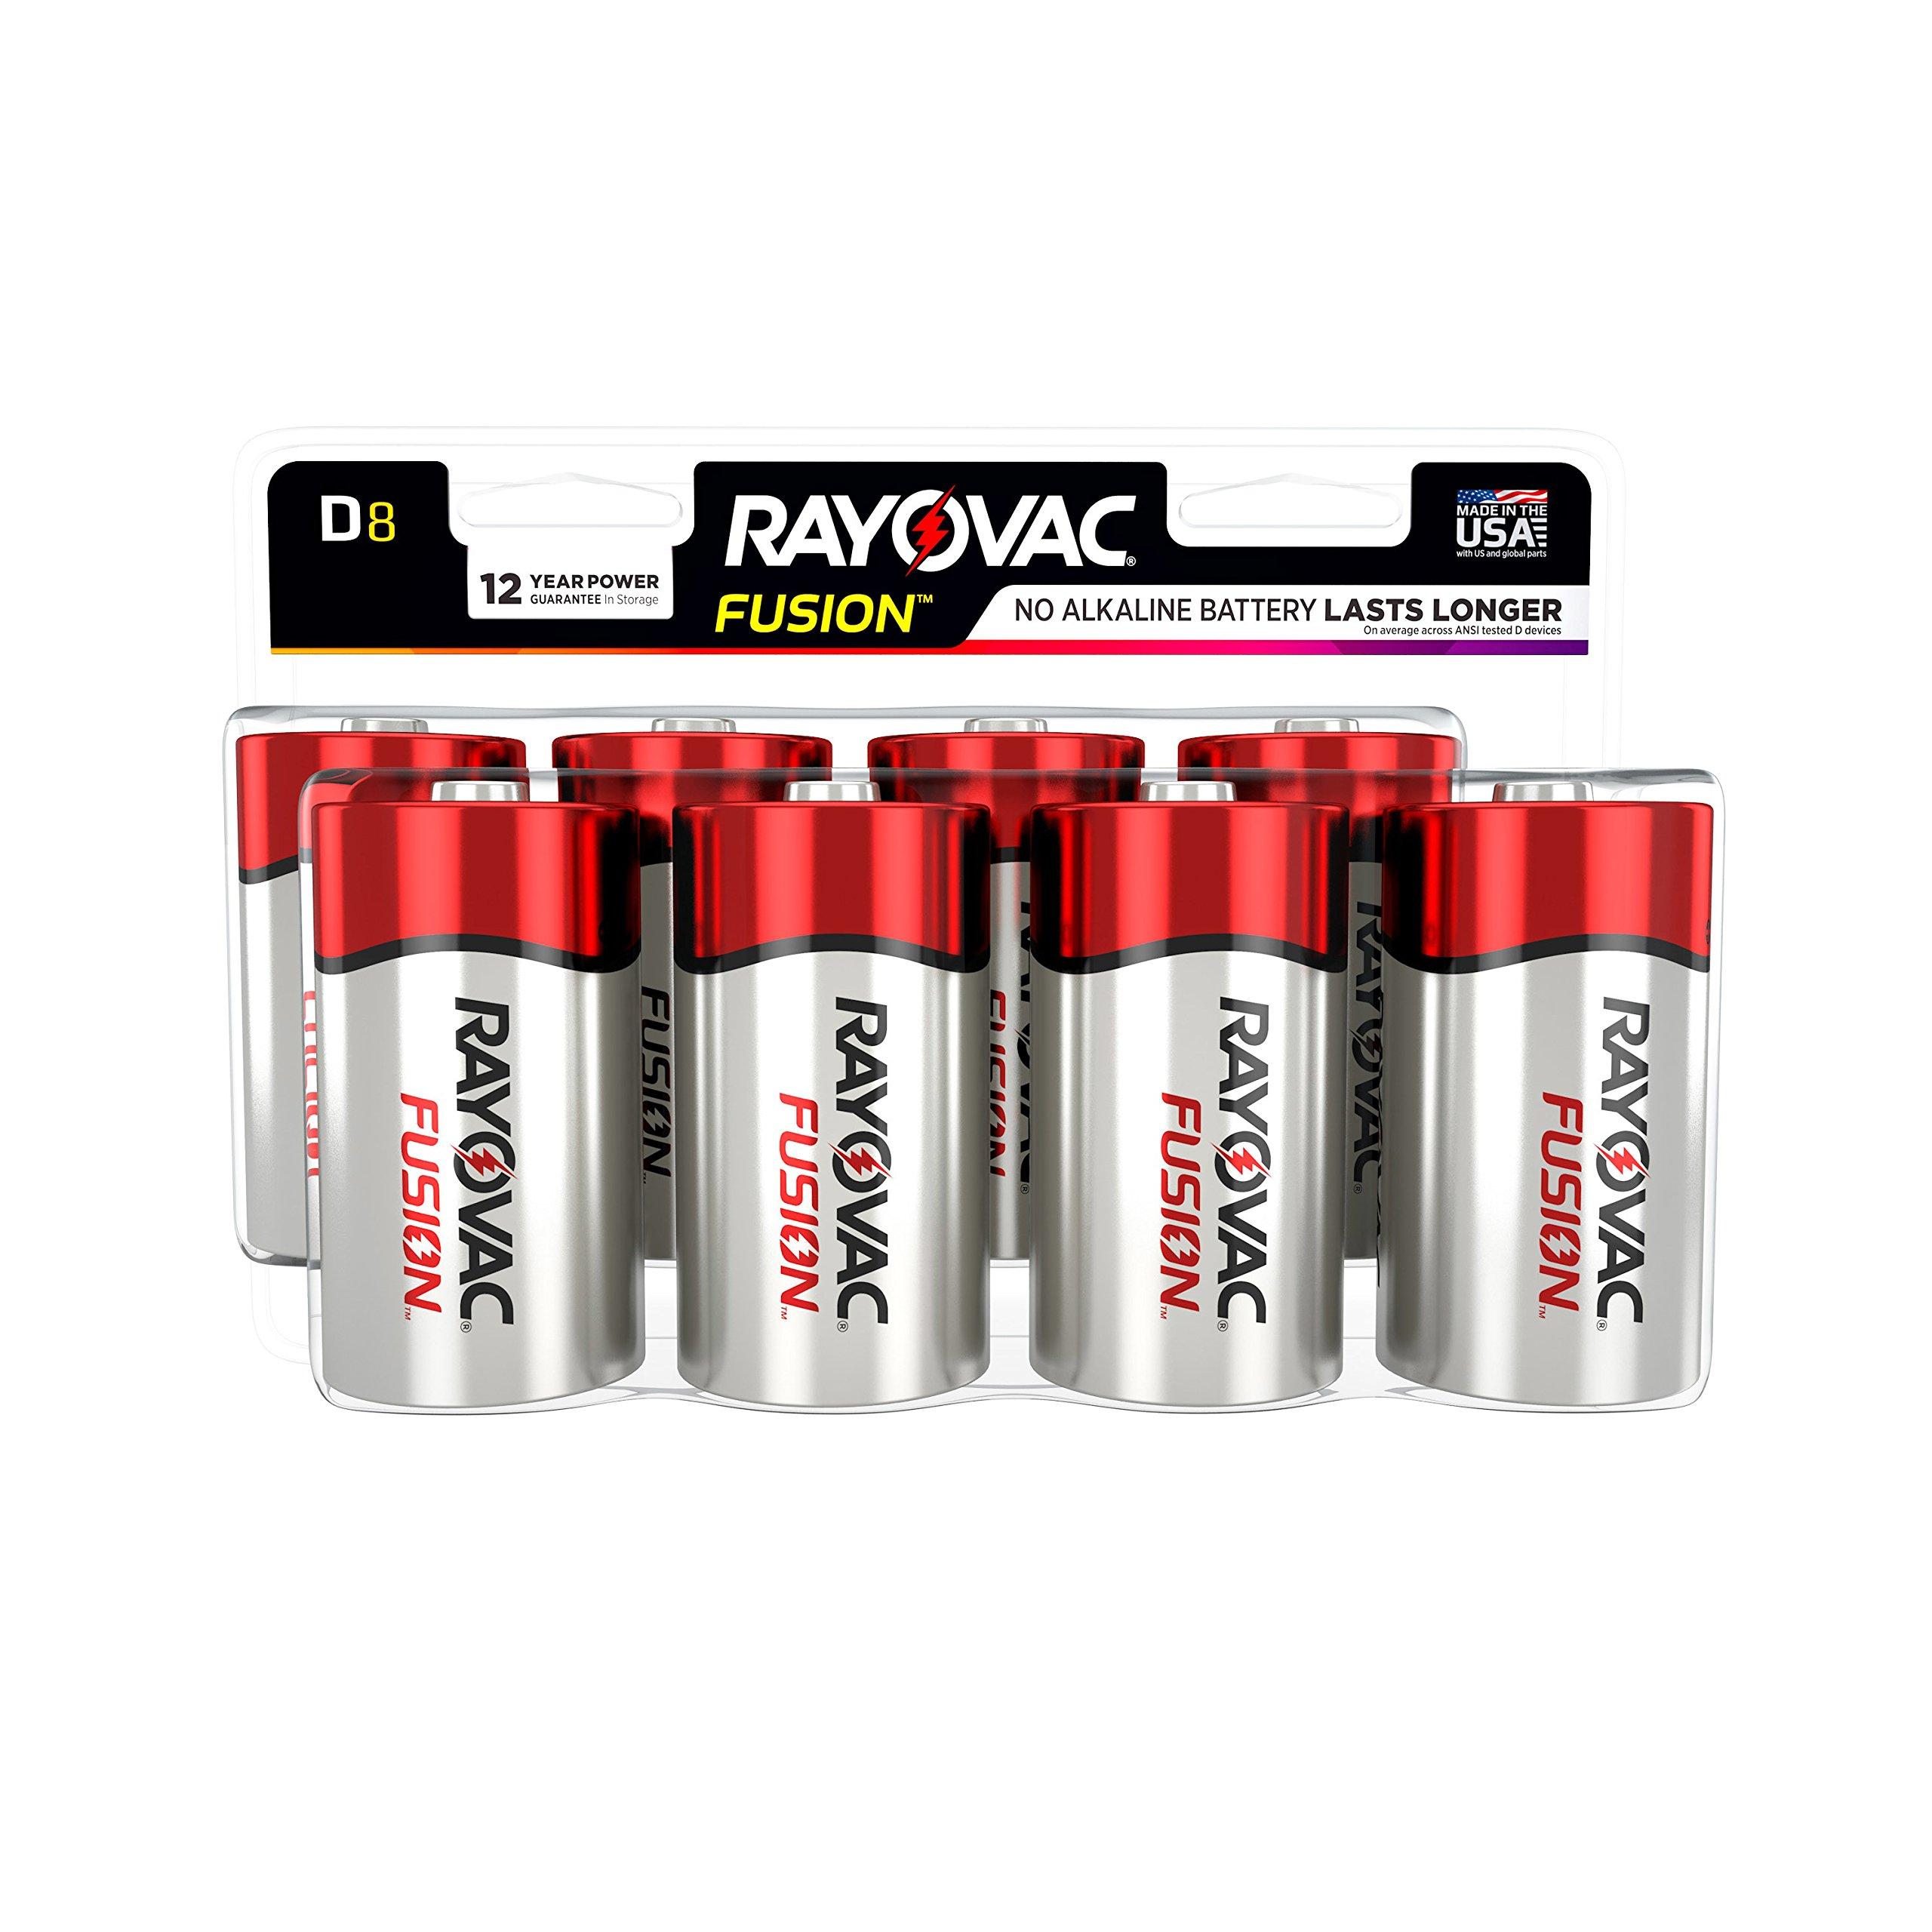 RAYOVAC D 8-Pack FUSION Premium Alkaline Batteries, 813-8LTFUSK